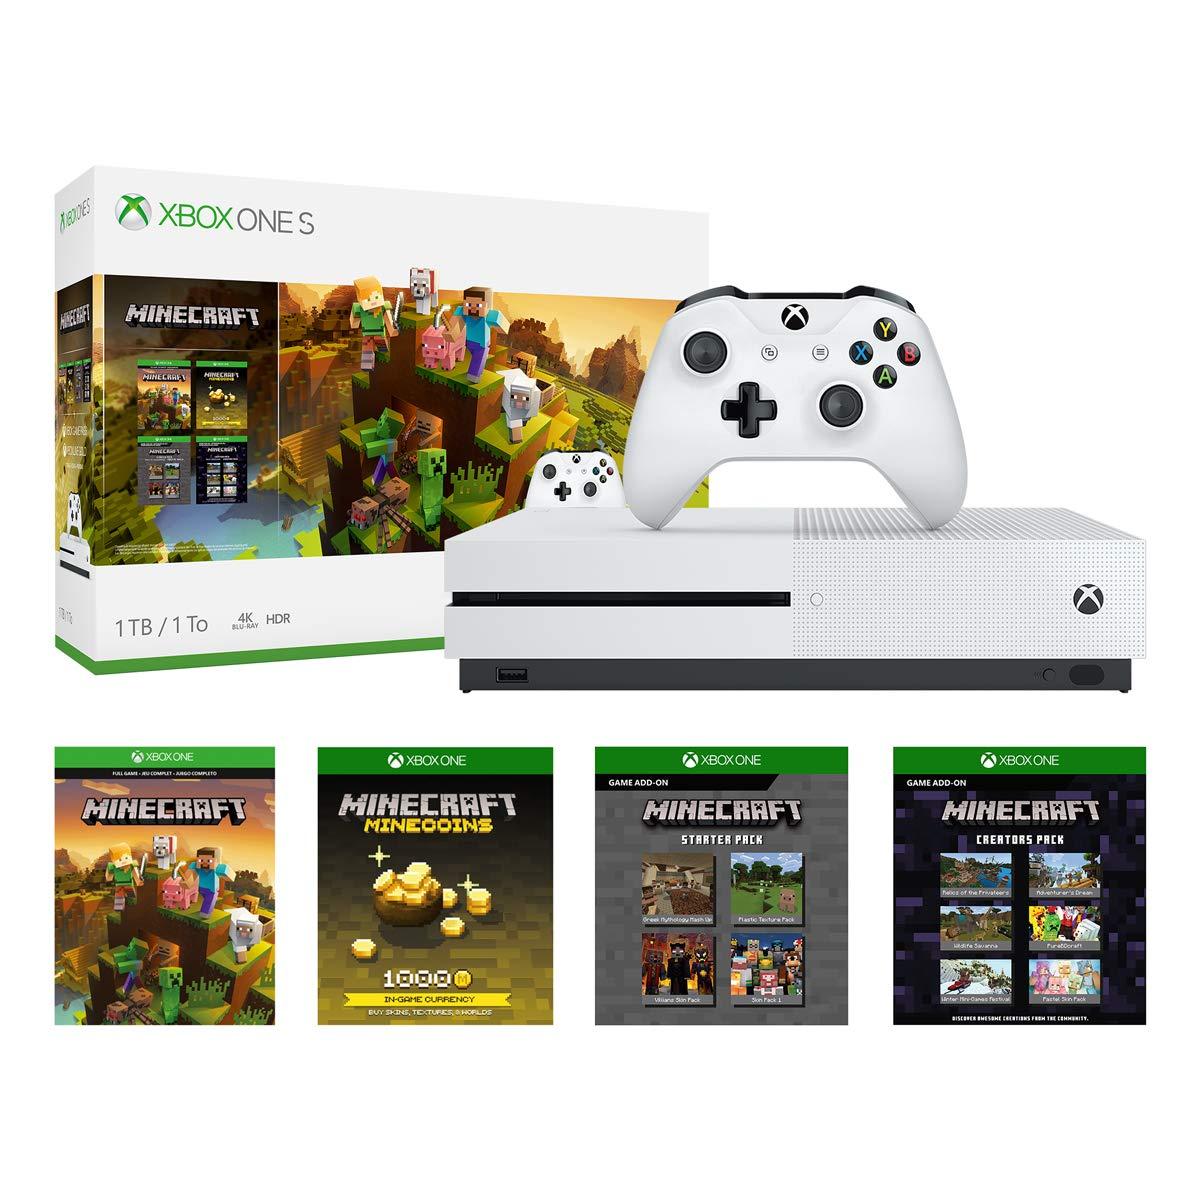 Xbox One S 1TB Console - Minecraft Creators Bundle - Xbox One S